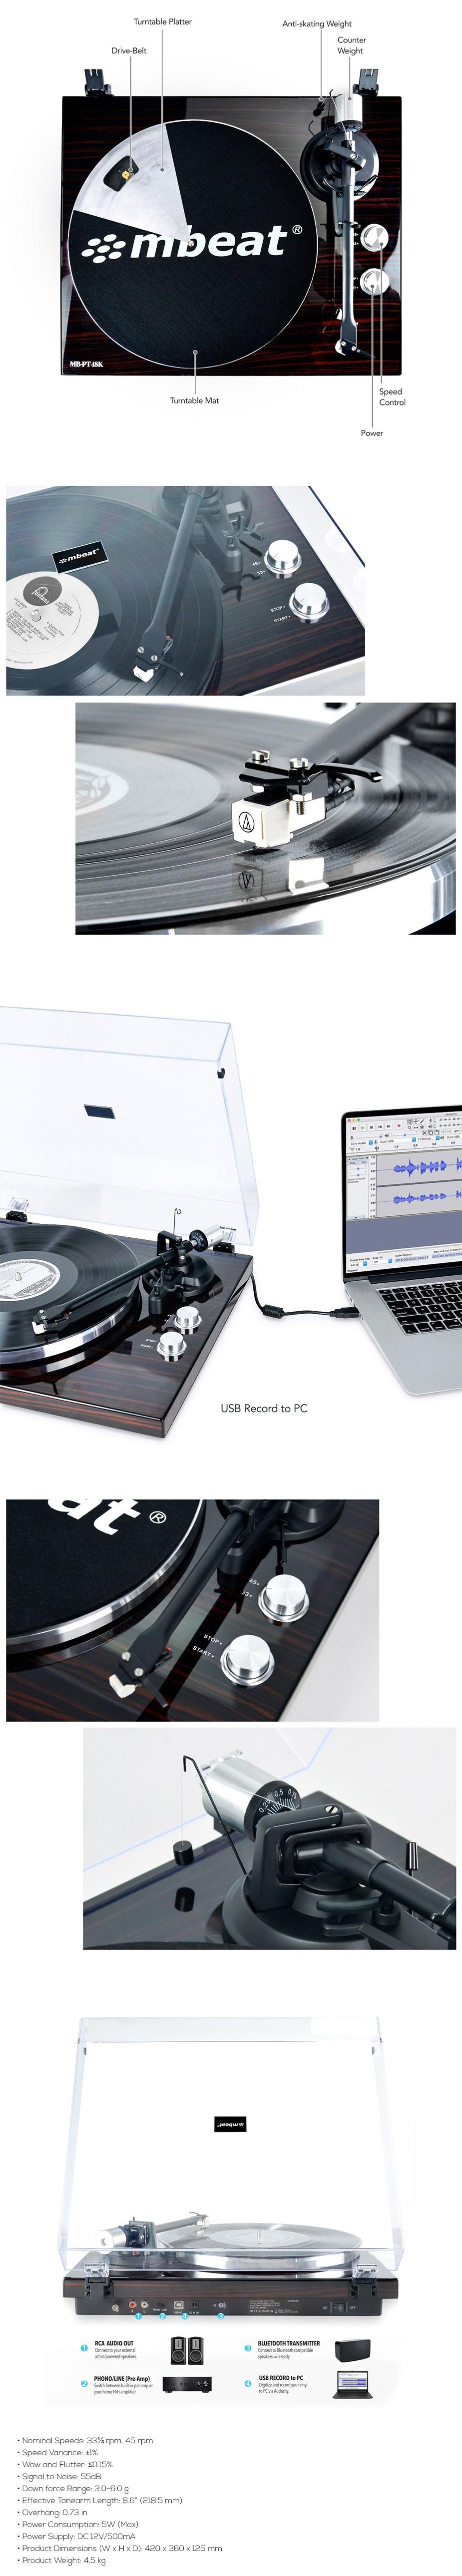 mbeat-hifi-bluetooth-turntable-player-matte-black-ac43902-3-1-.jpg